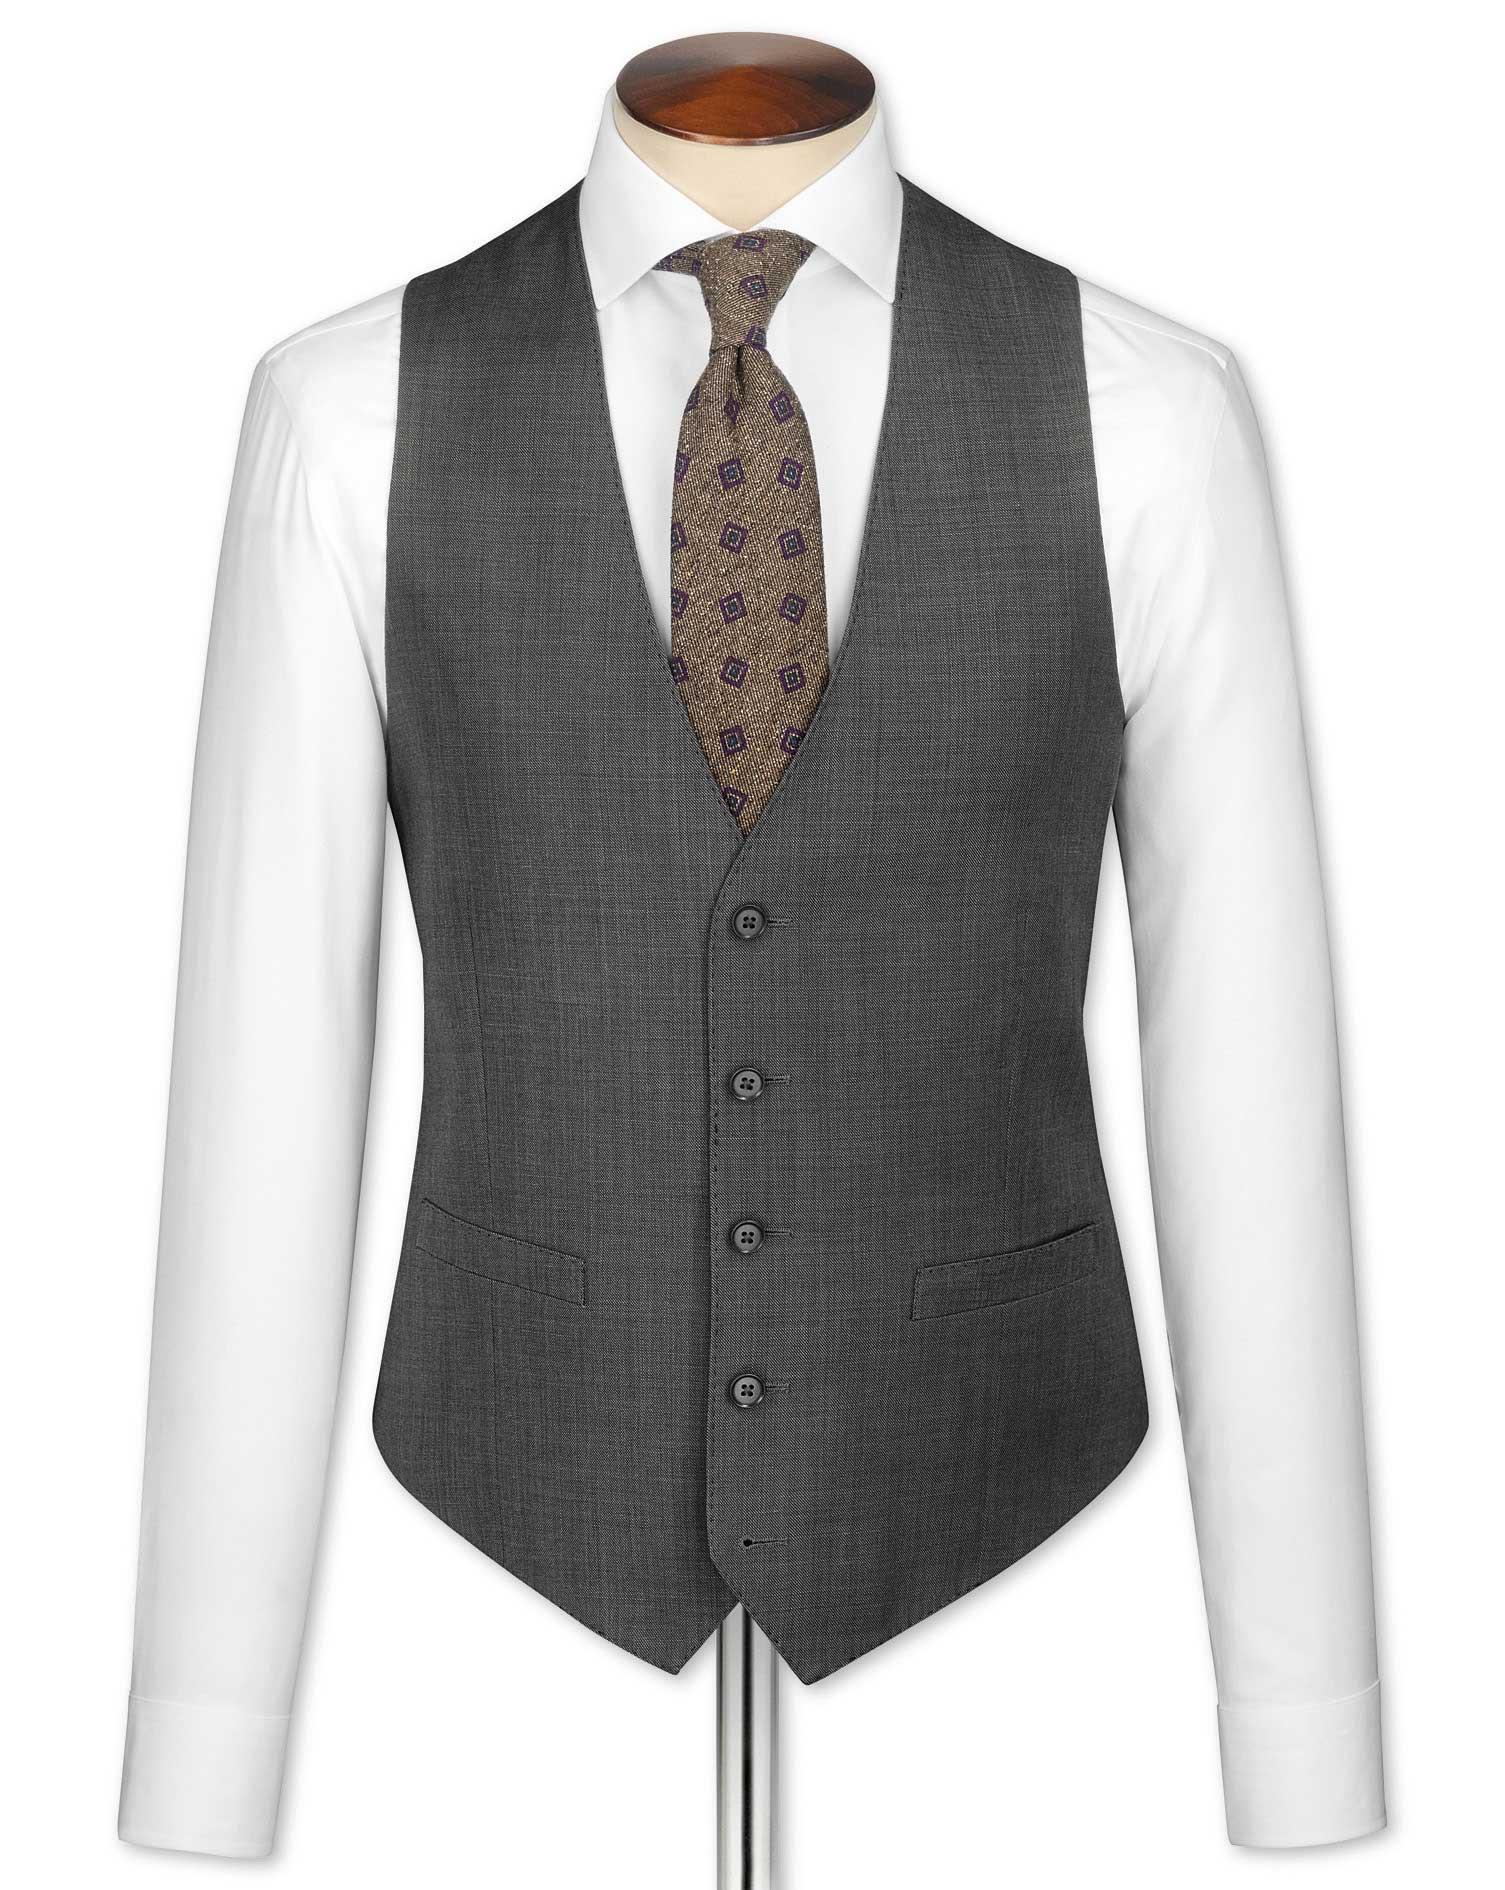 Grey Slim Fit Sharkskin Travel Suit Wool Waistcoat Size w46 by Charles Tyrwhitt